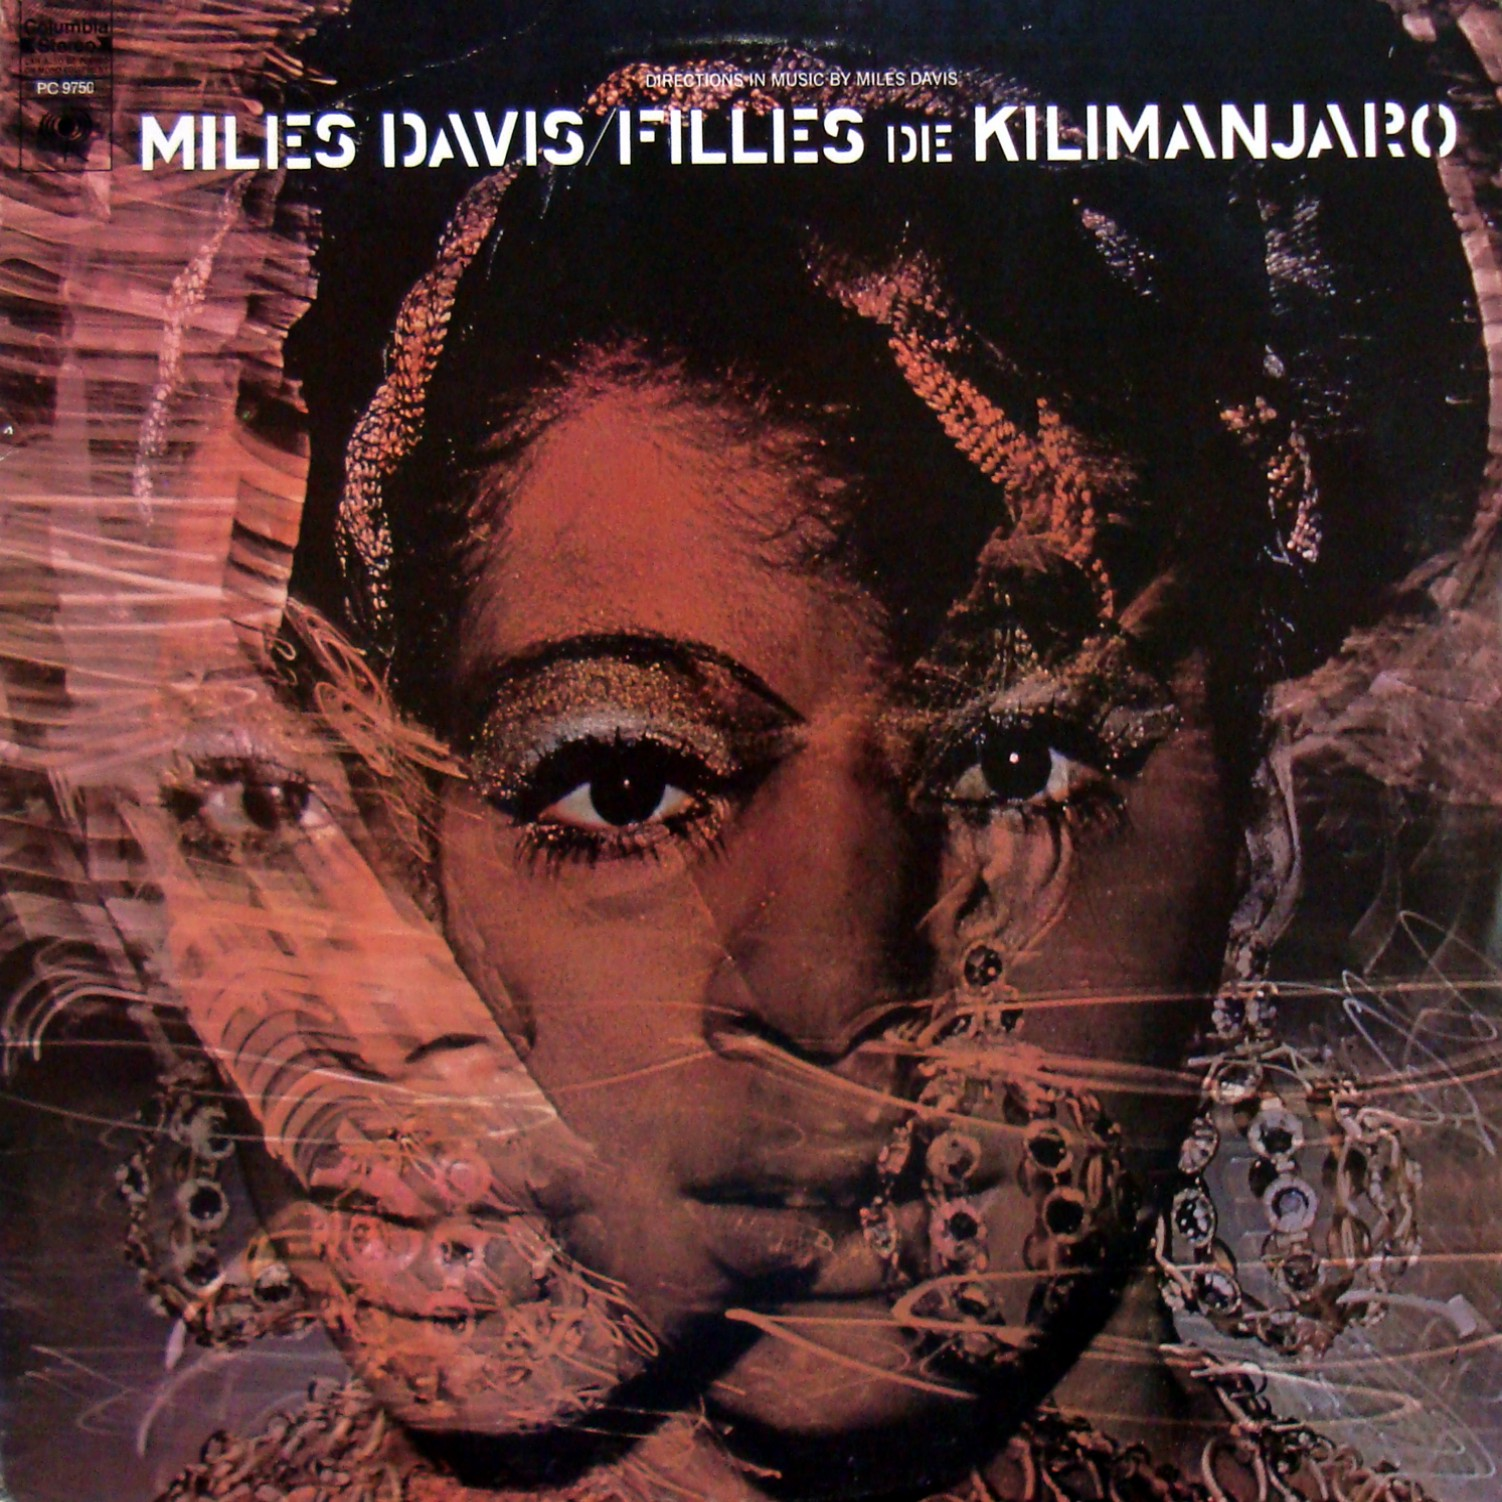 Miles Davis — Filles de Kilimanjaro